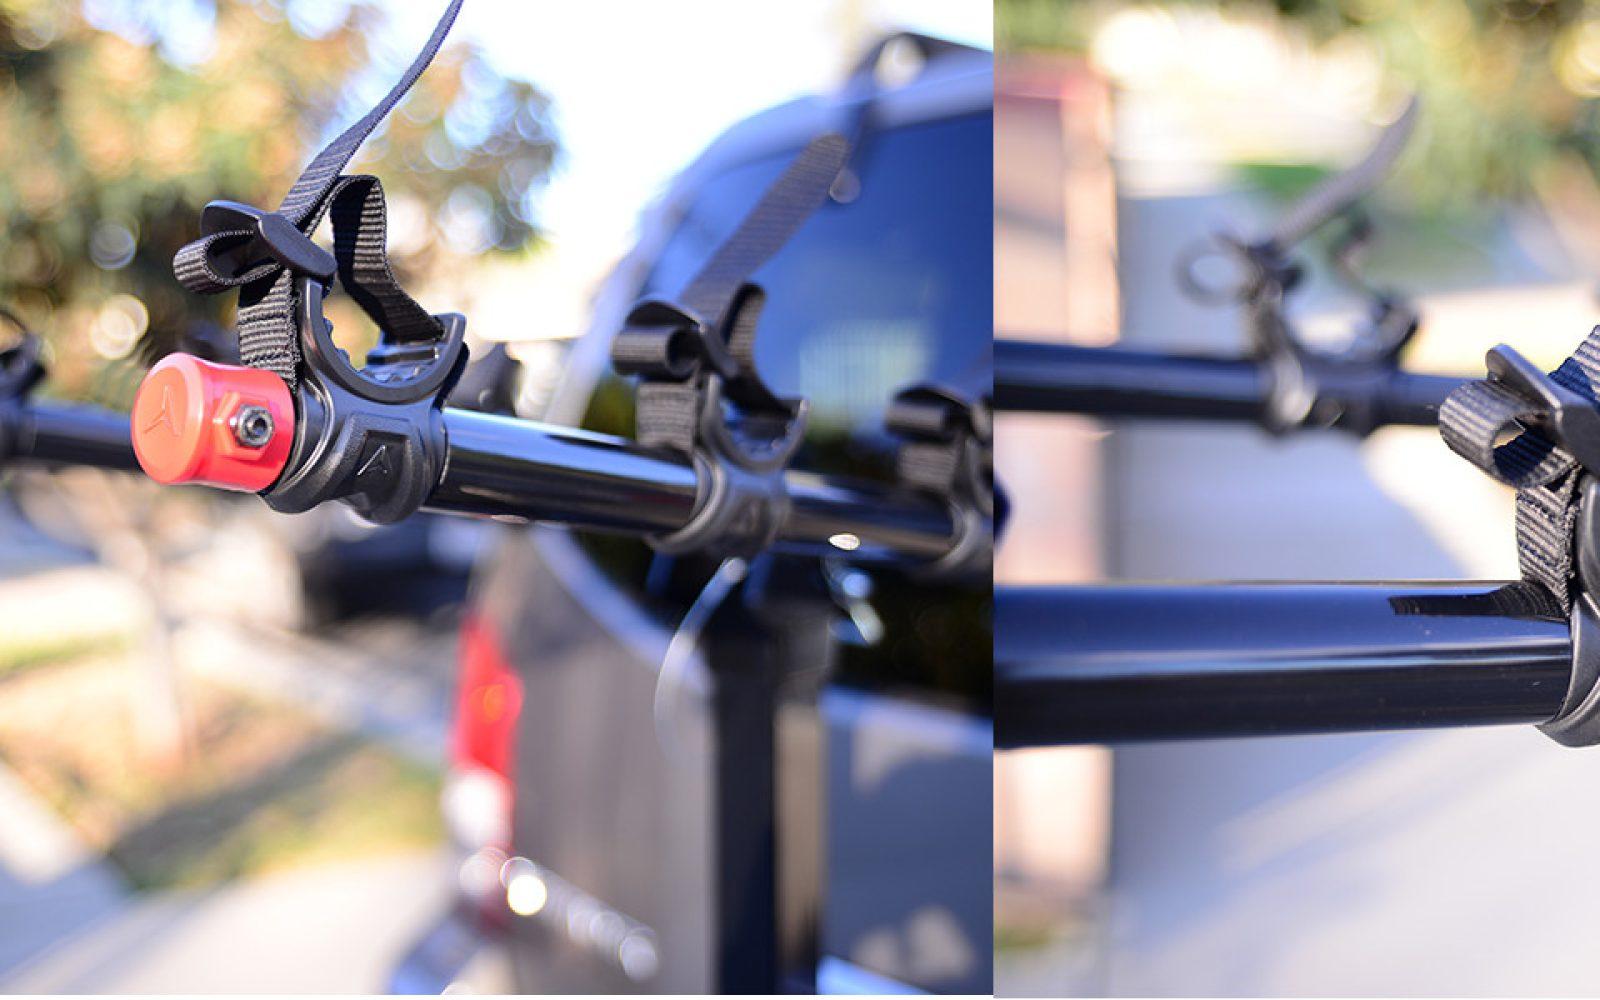 7a3dc46ef59c2 Sports/Fitness: 25% off Allen Car Bike Racks from $35, $50 Sports ...